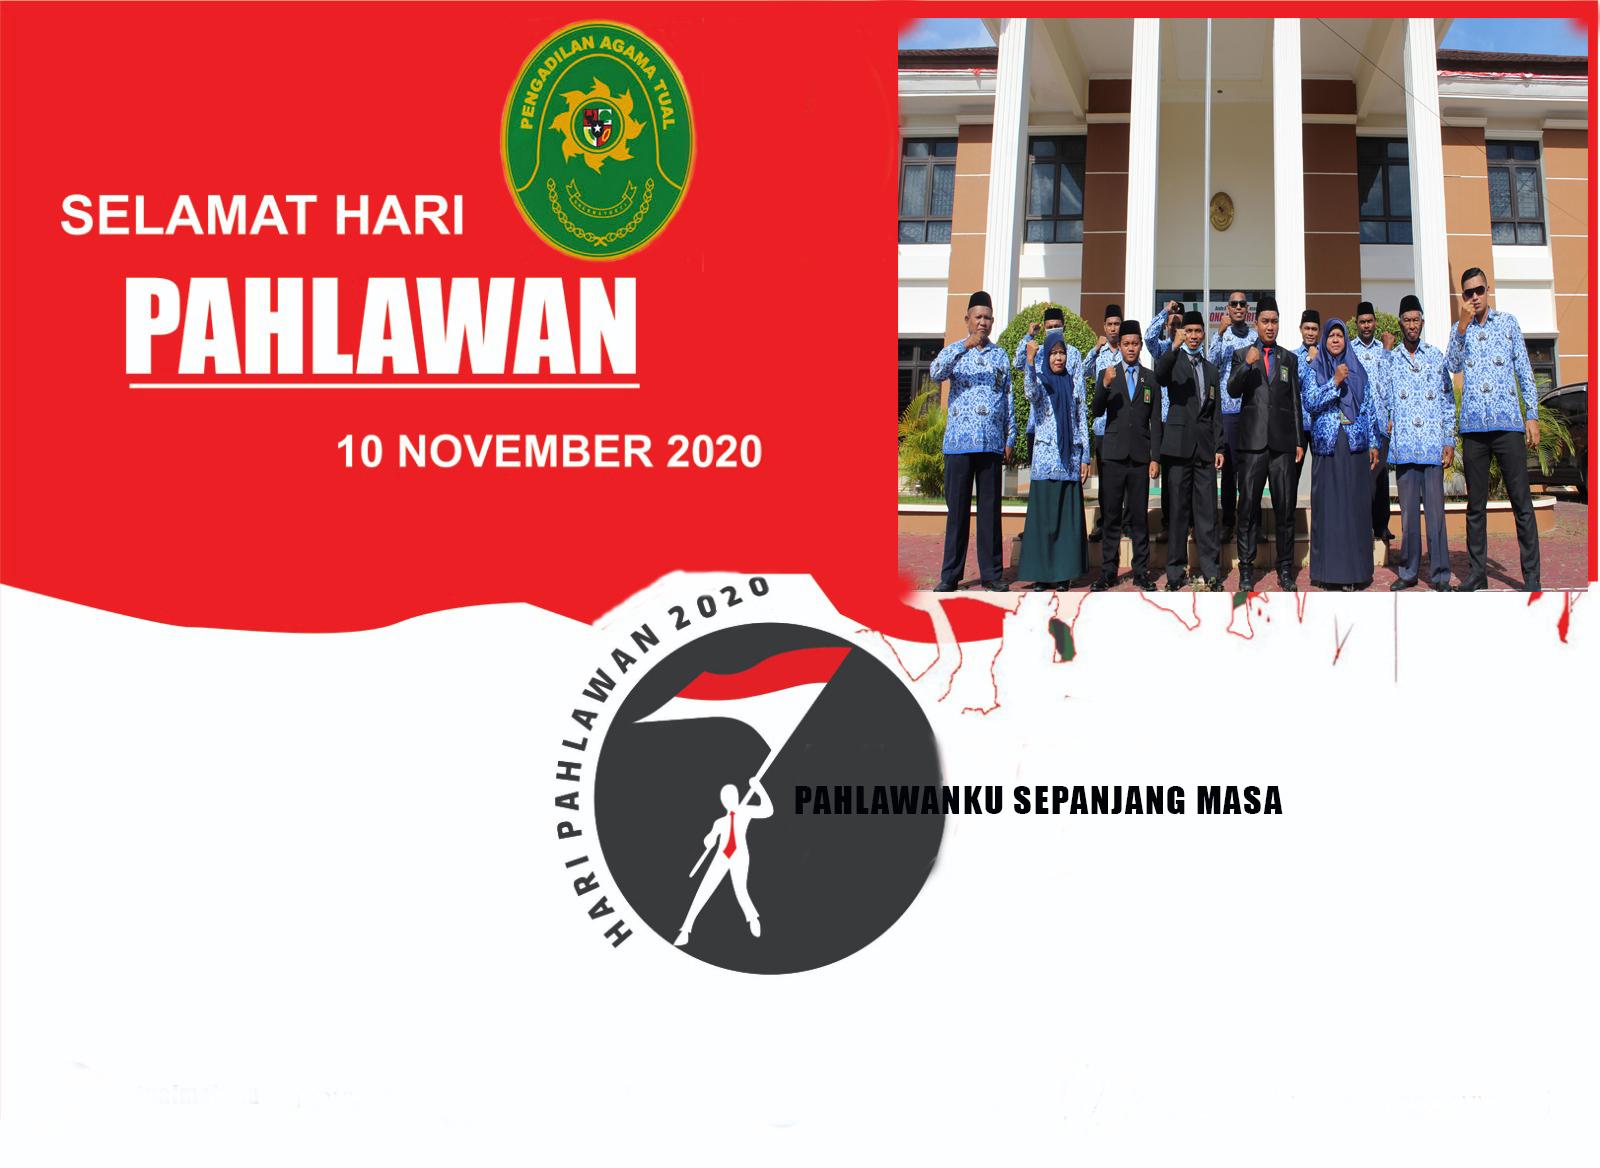 SELAMAT HARI PAHLAWAN 10 NOPEMBER 2020